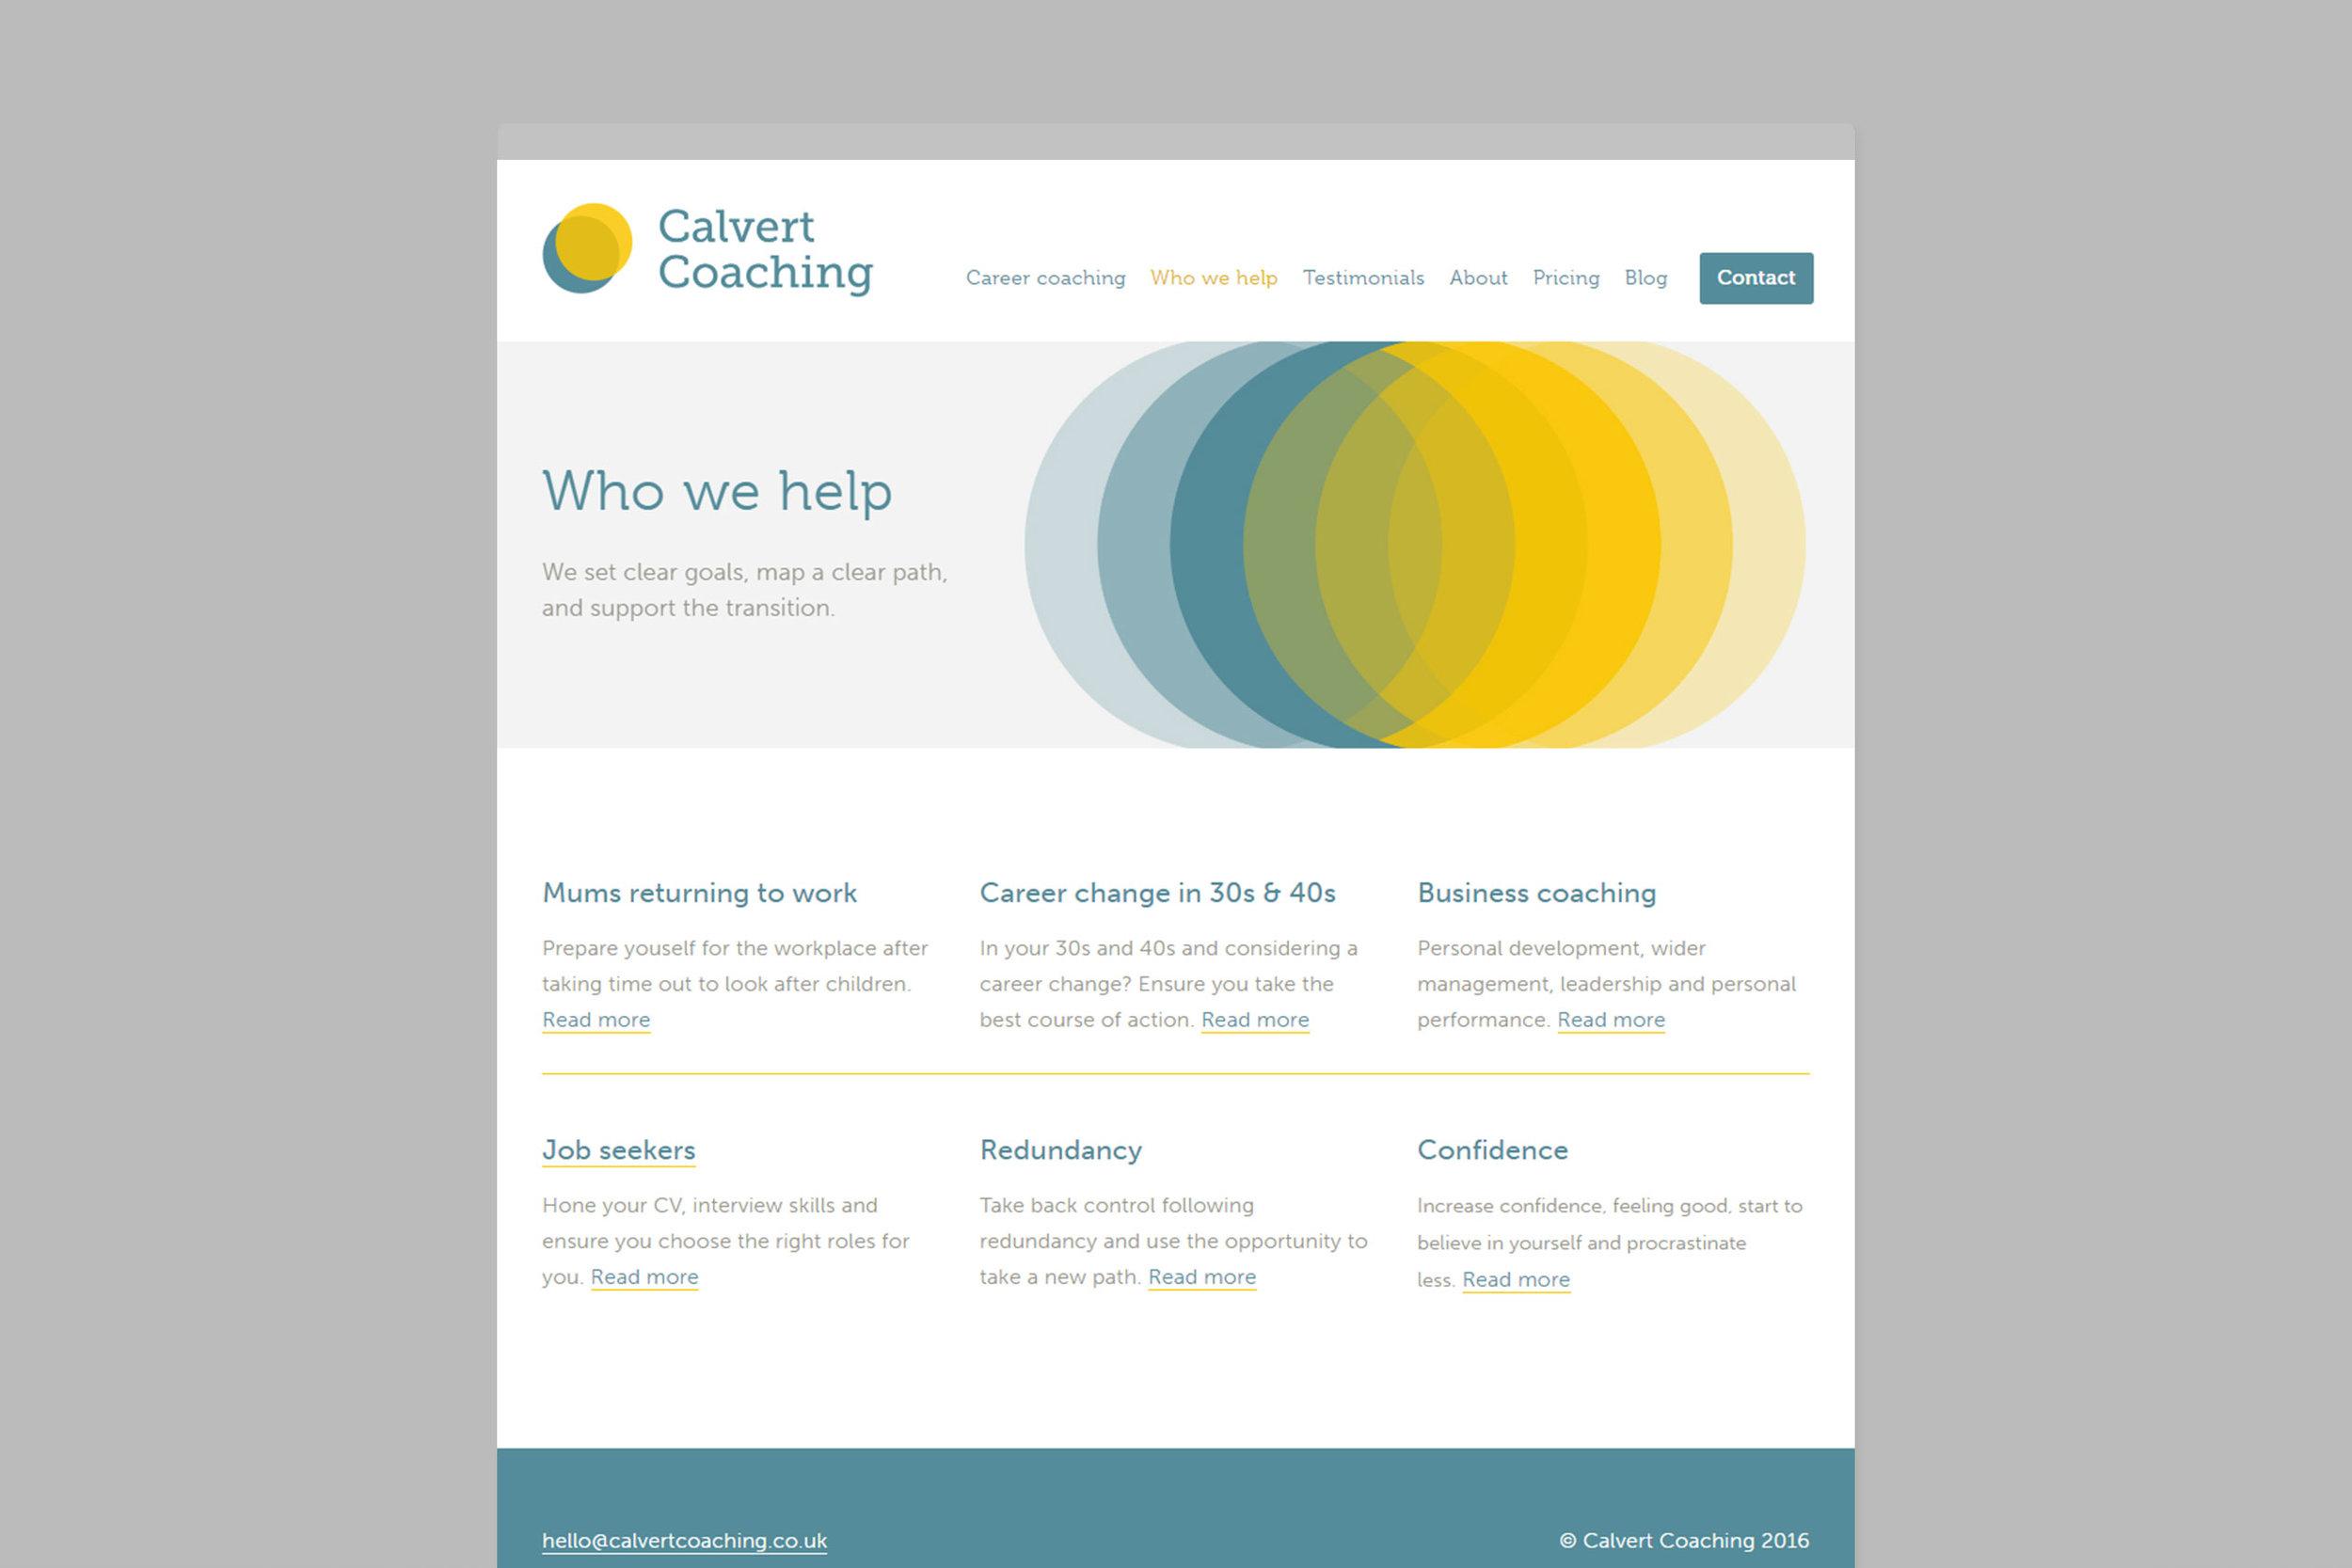 Calvert-Coaching-Canvas3.jpg